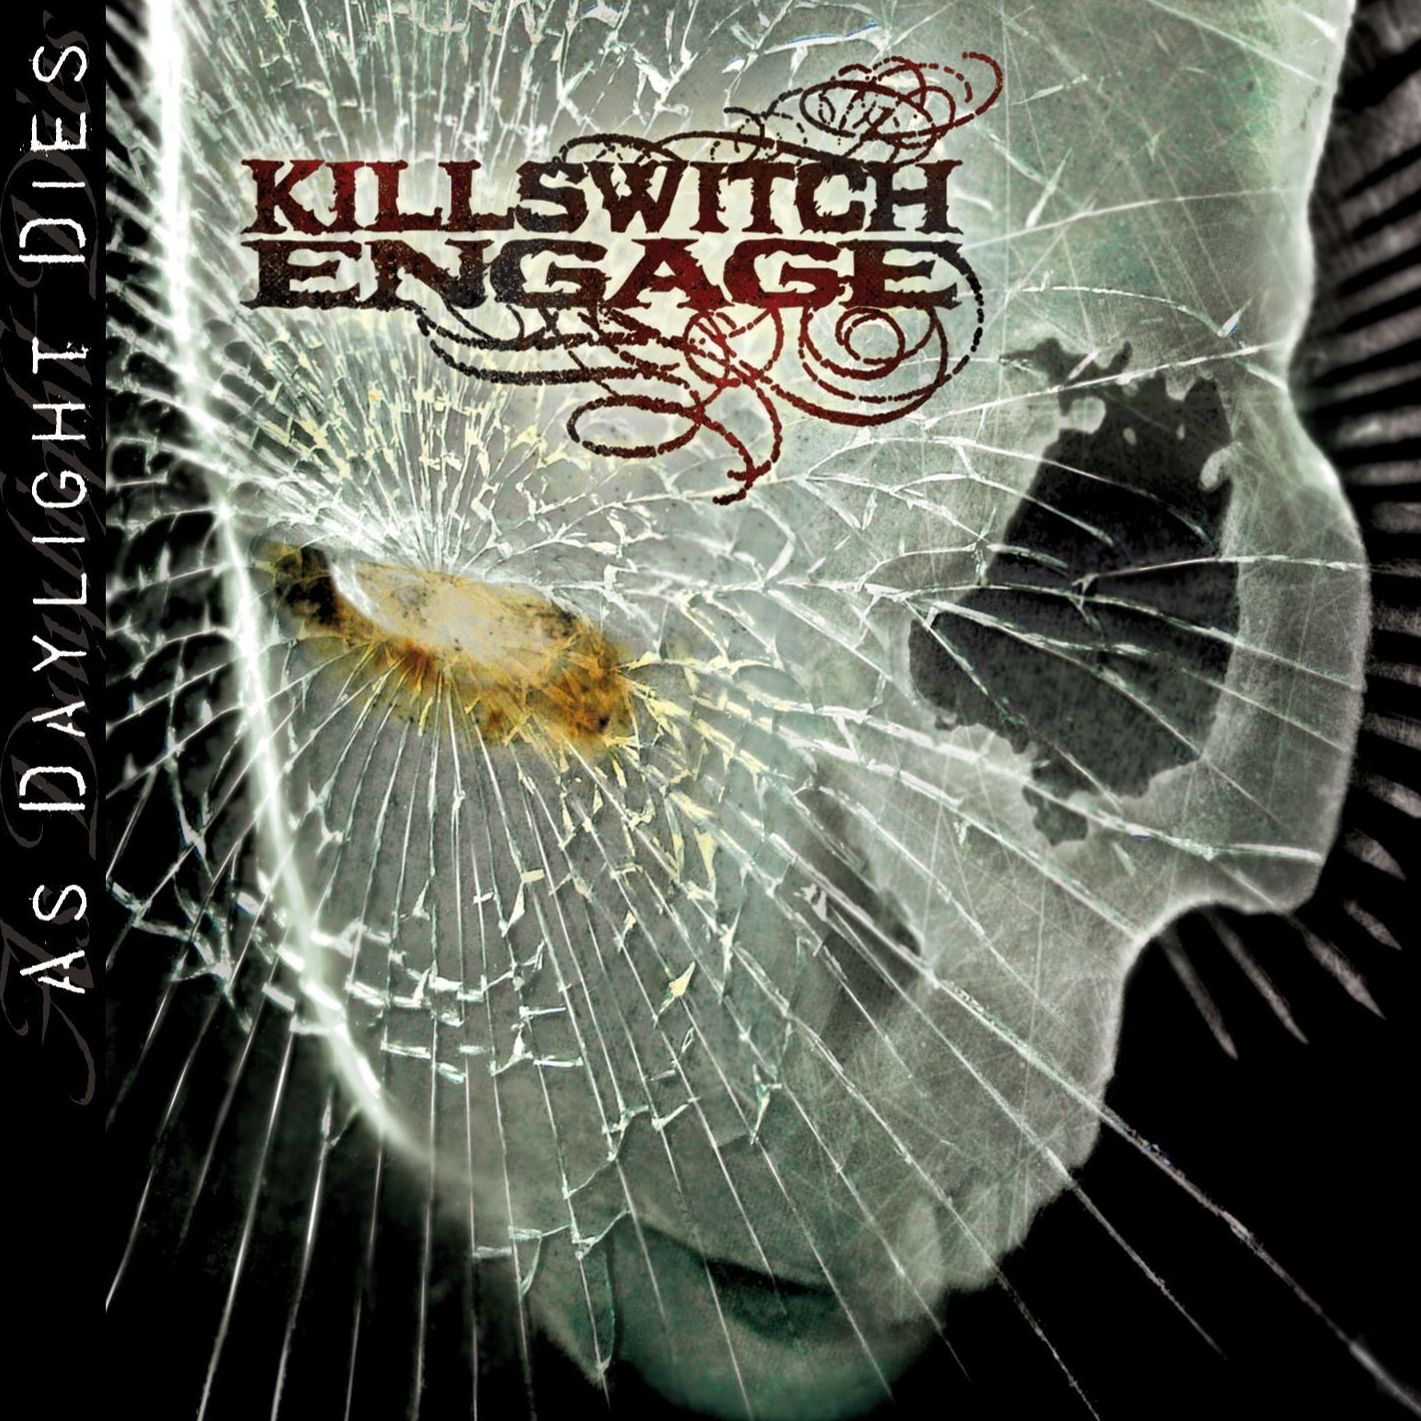 killswitch engage lyrics as daylight: